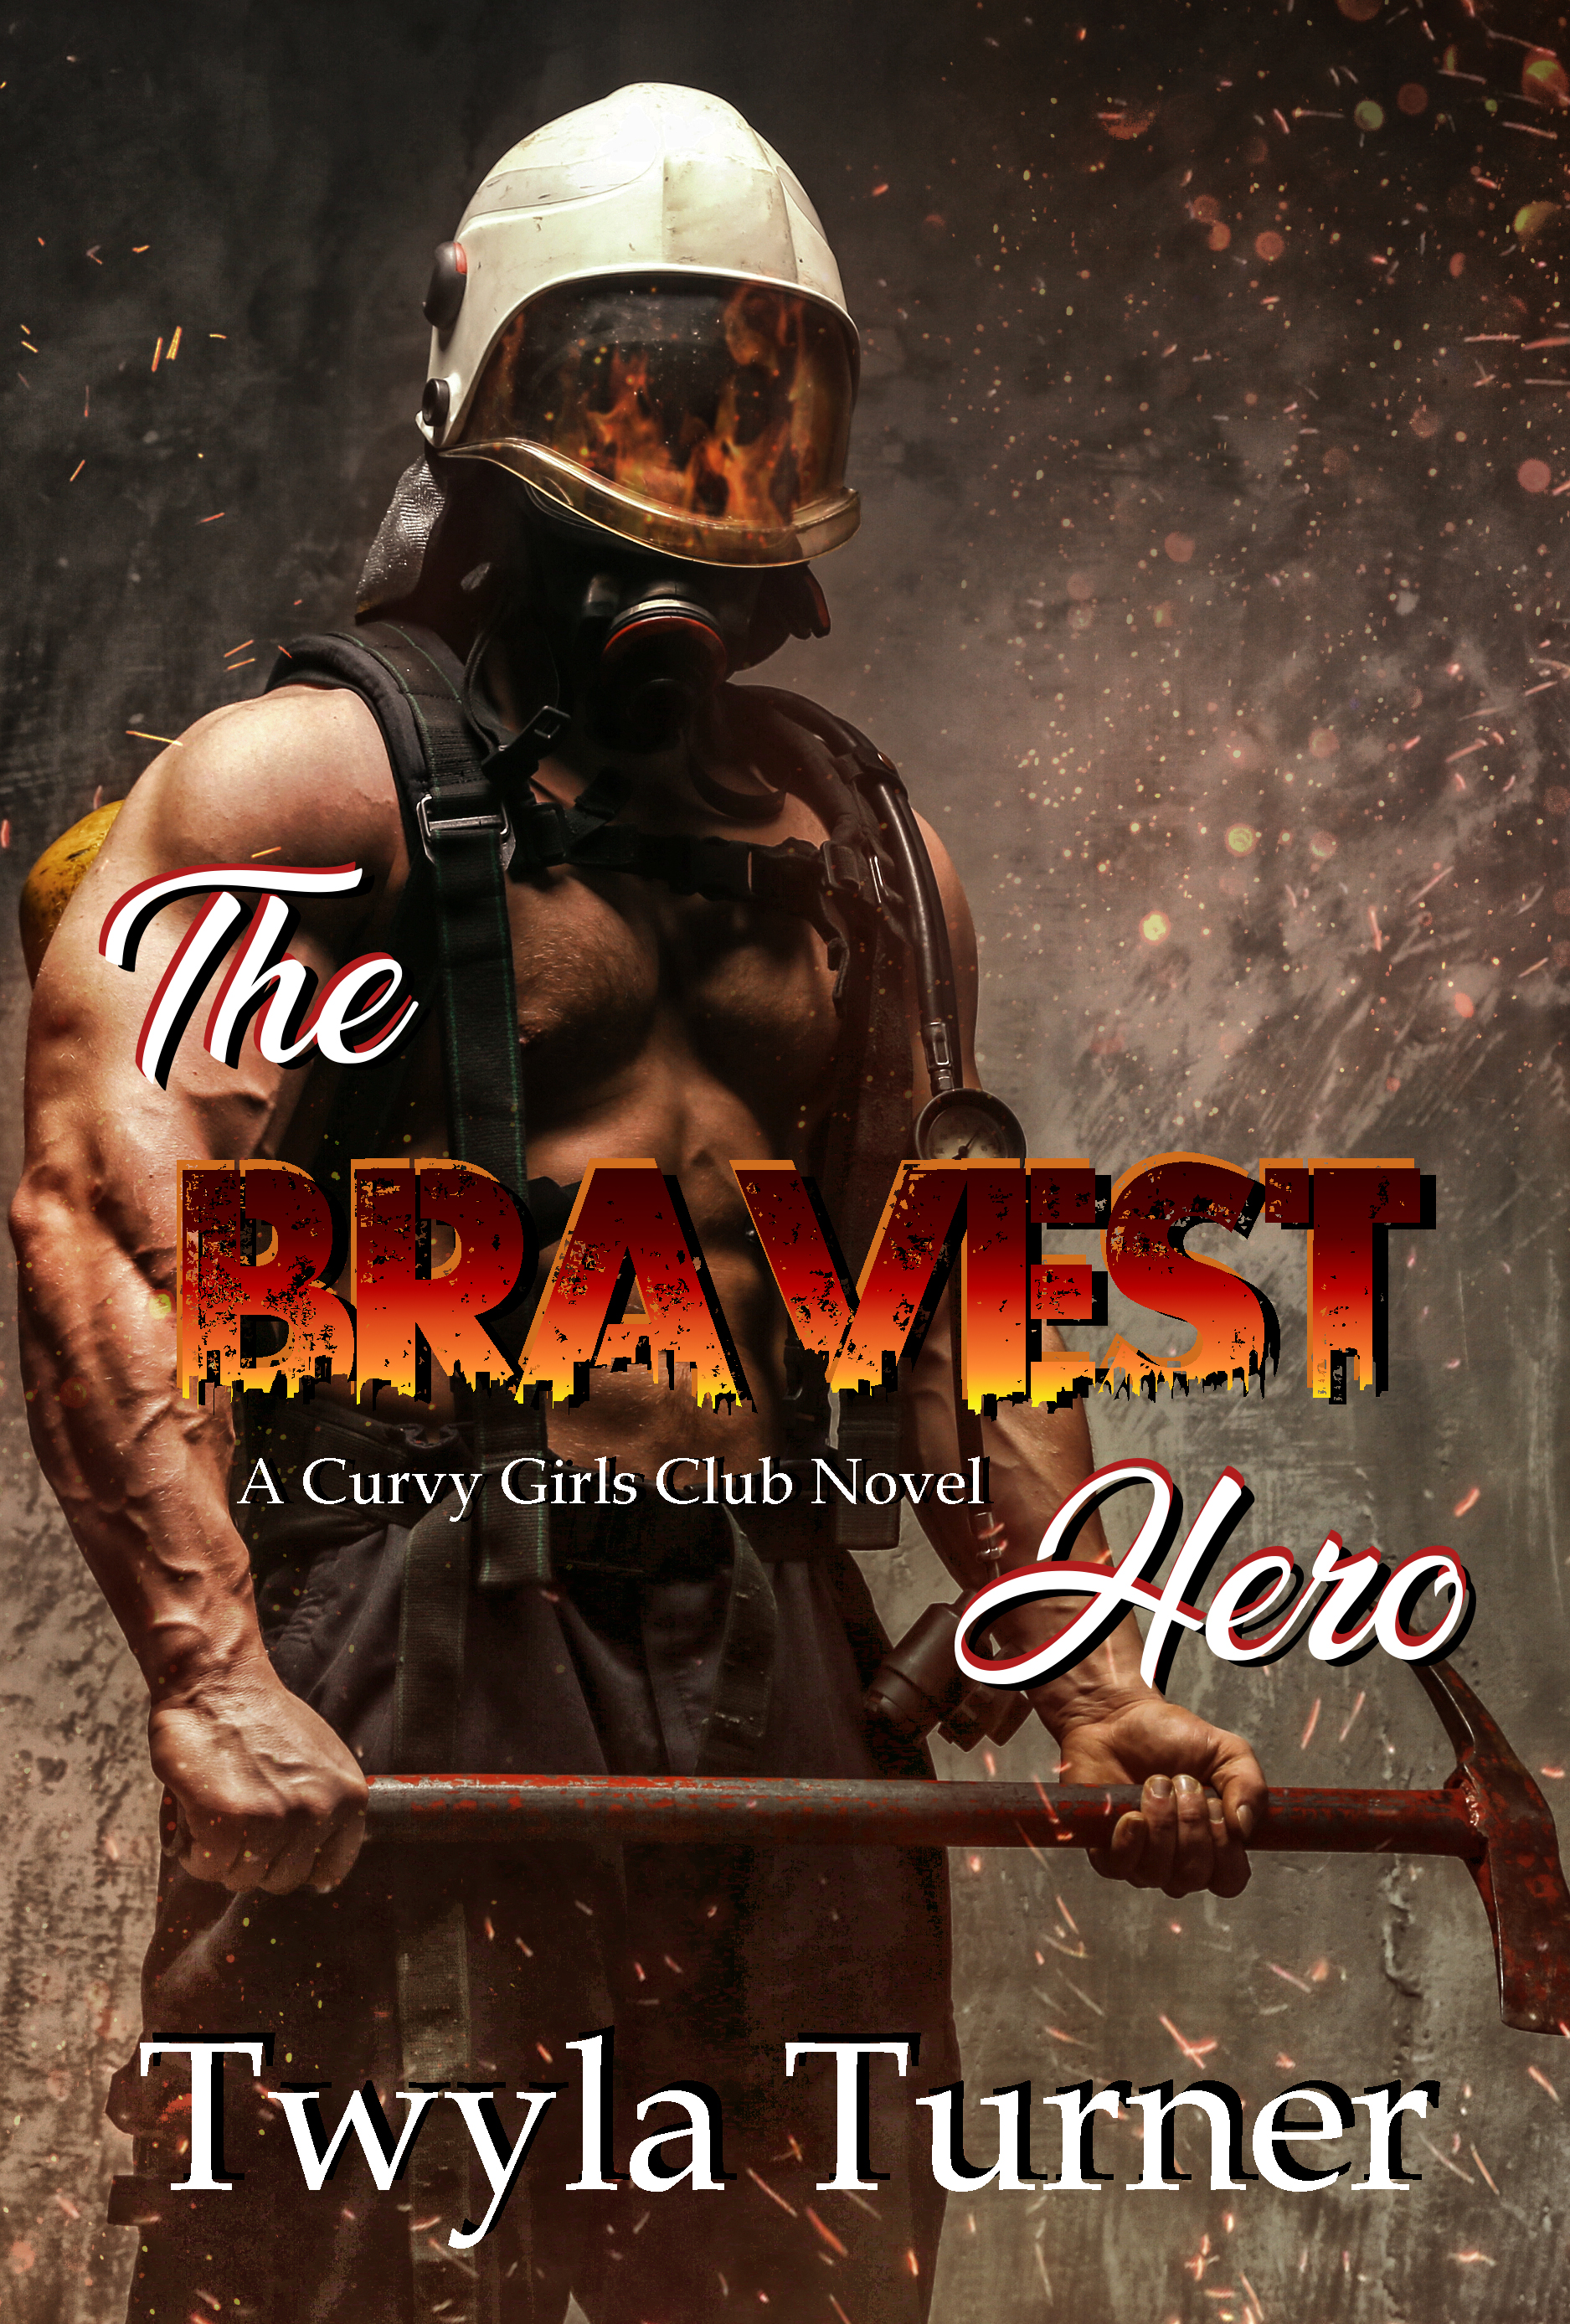 The Bravest Hero